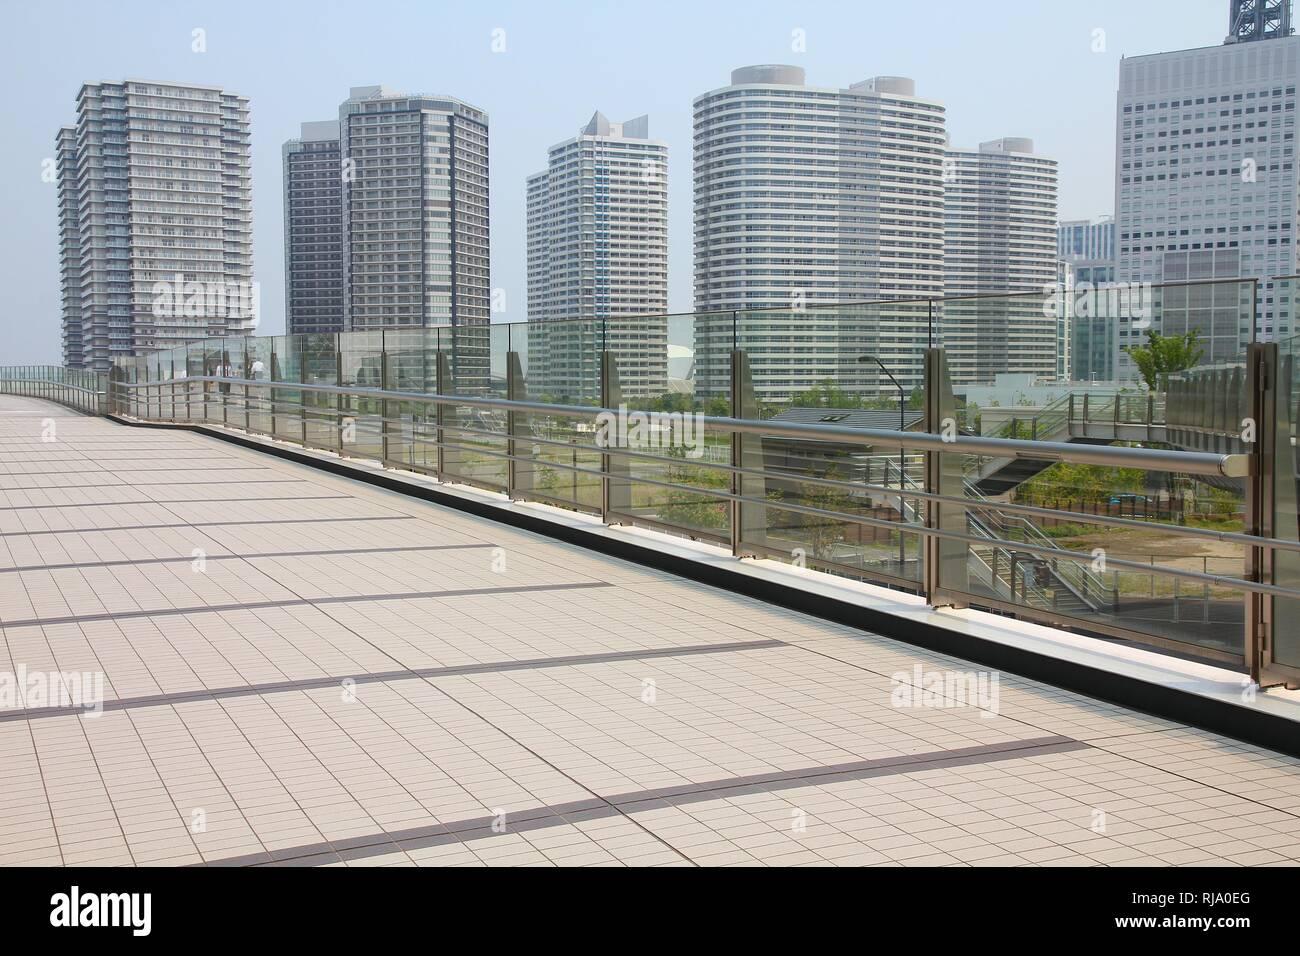 Yokohama, Japan - skyscrapers in second largest city in Japan, capital city of Kanagawa prefecture - Stock Image